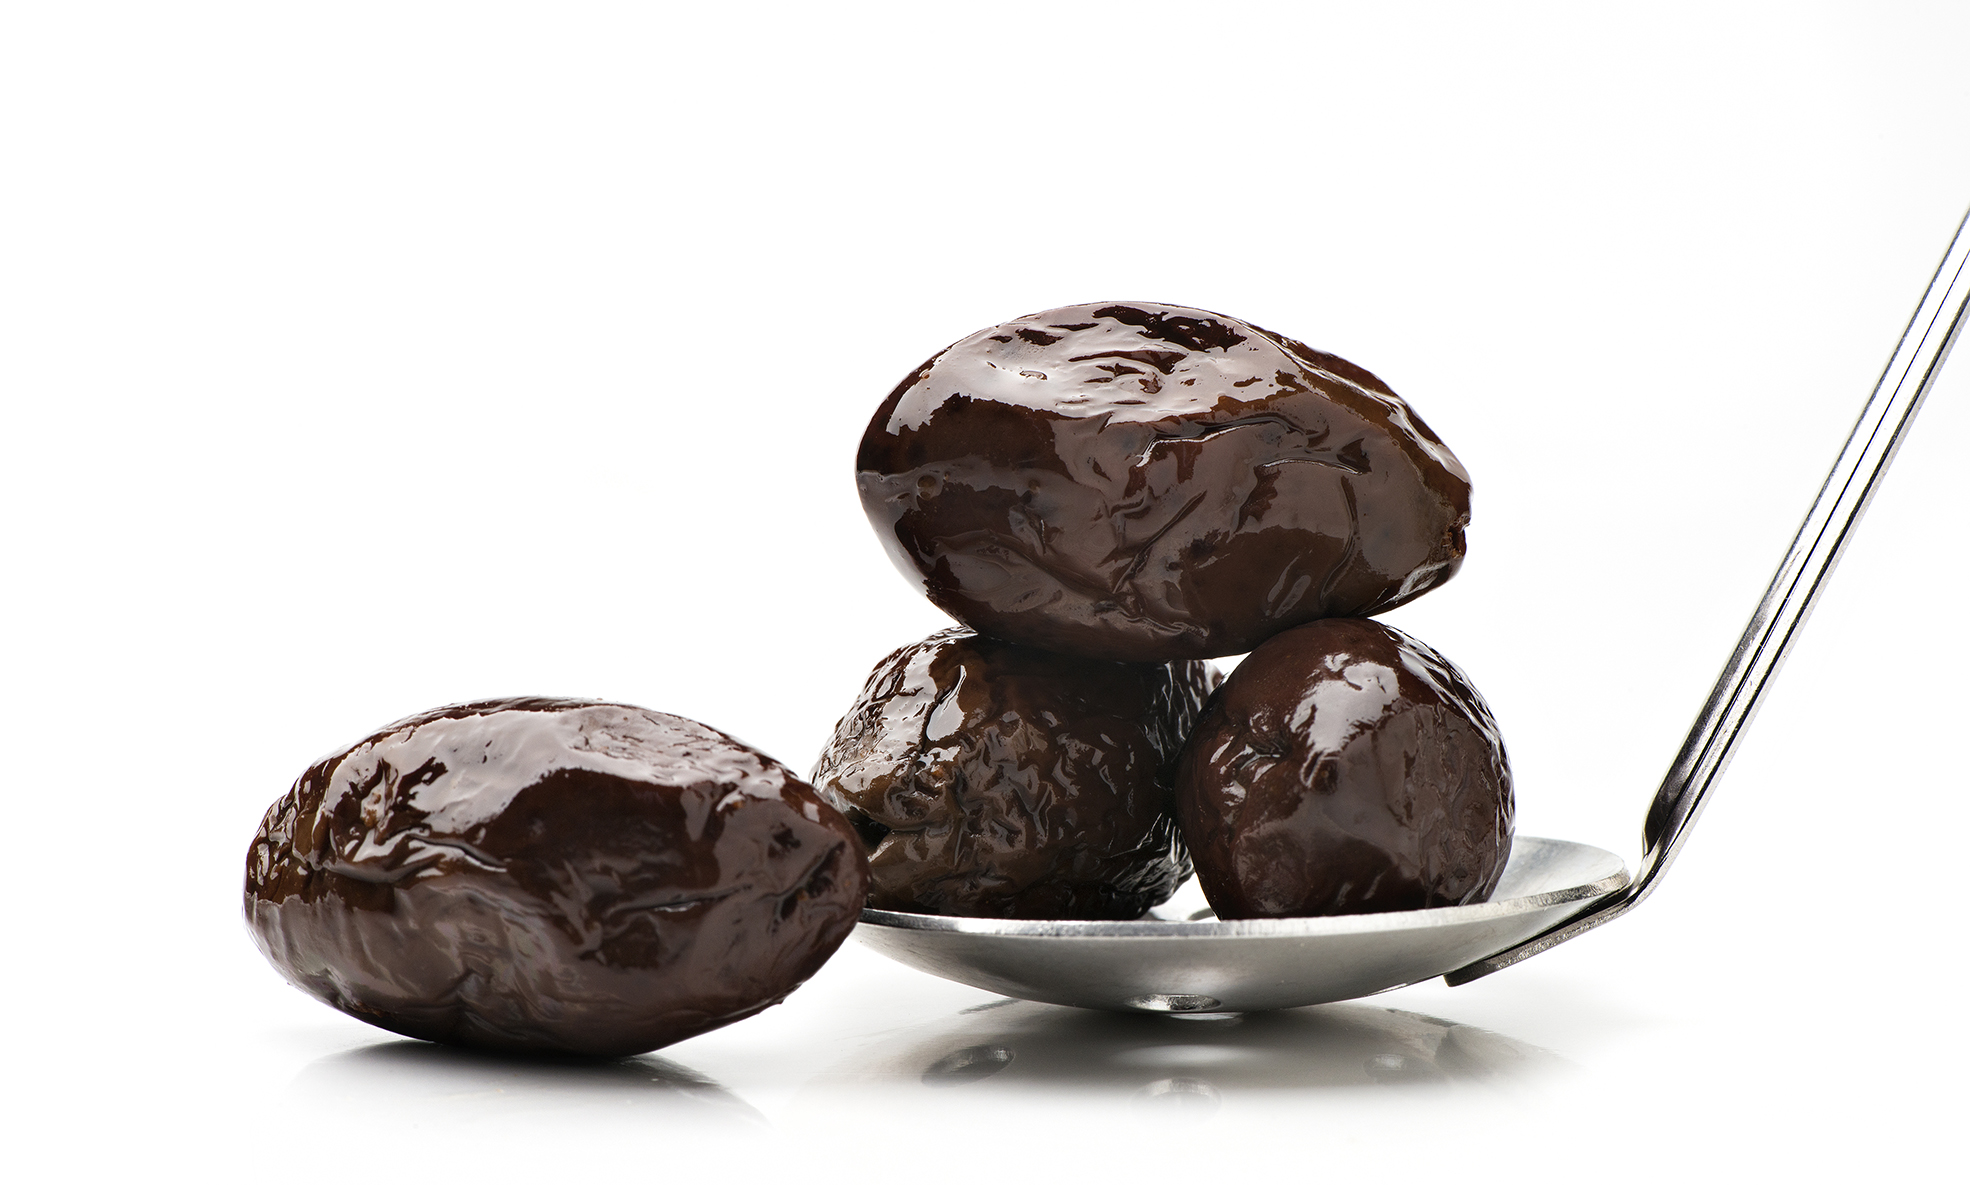 Black Wrinkled Prune Olive - Naturally Prepared